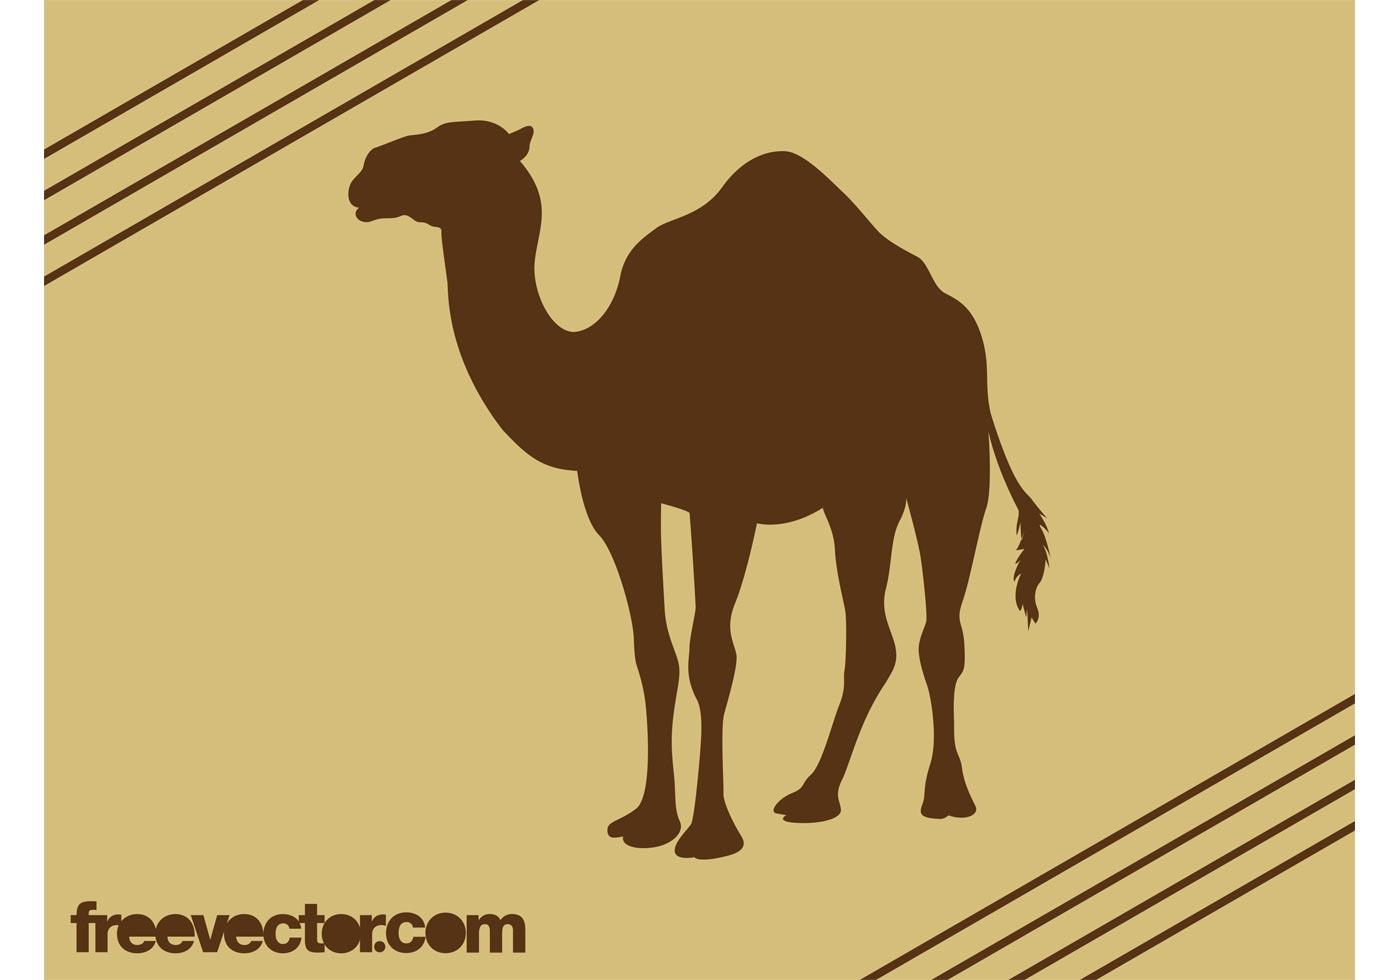 Camel Silhouette Vector - Download Free Vector Art, Stock ...